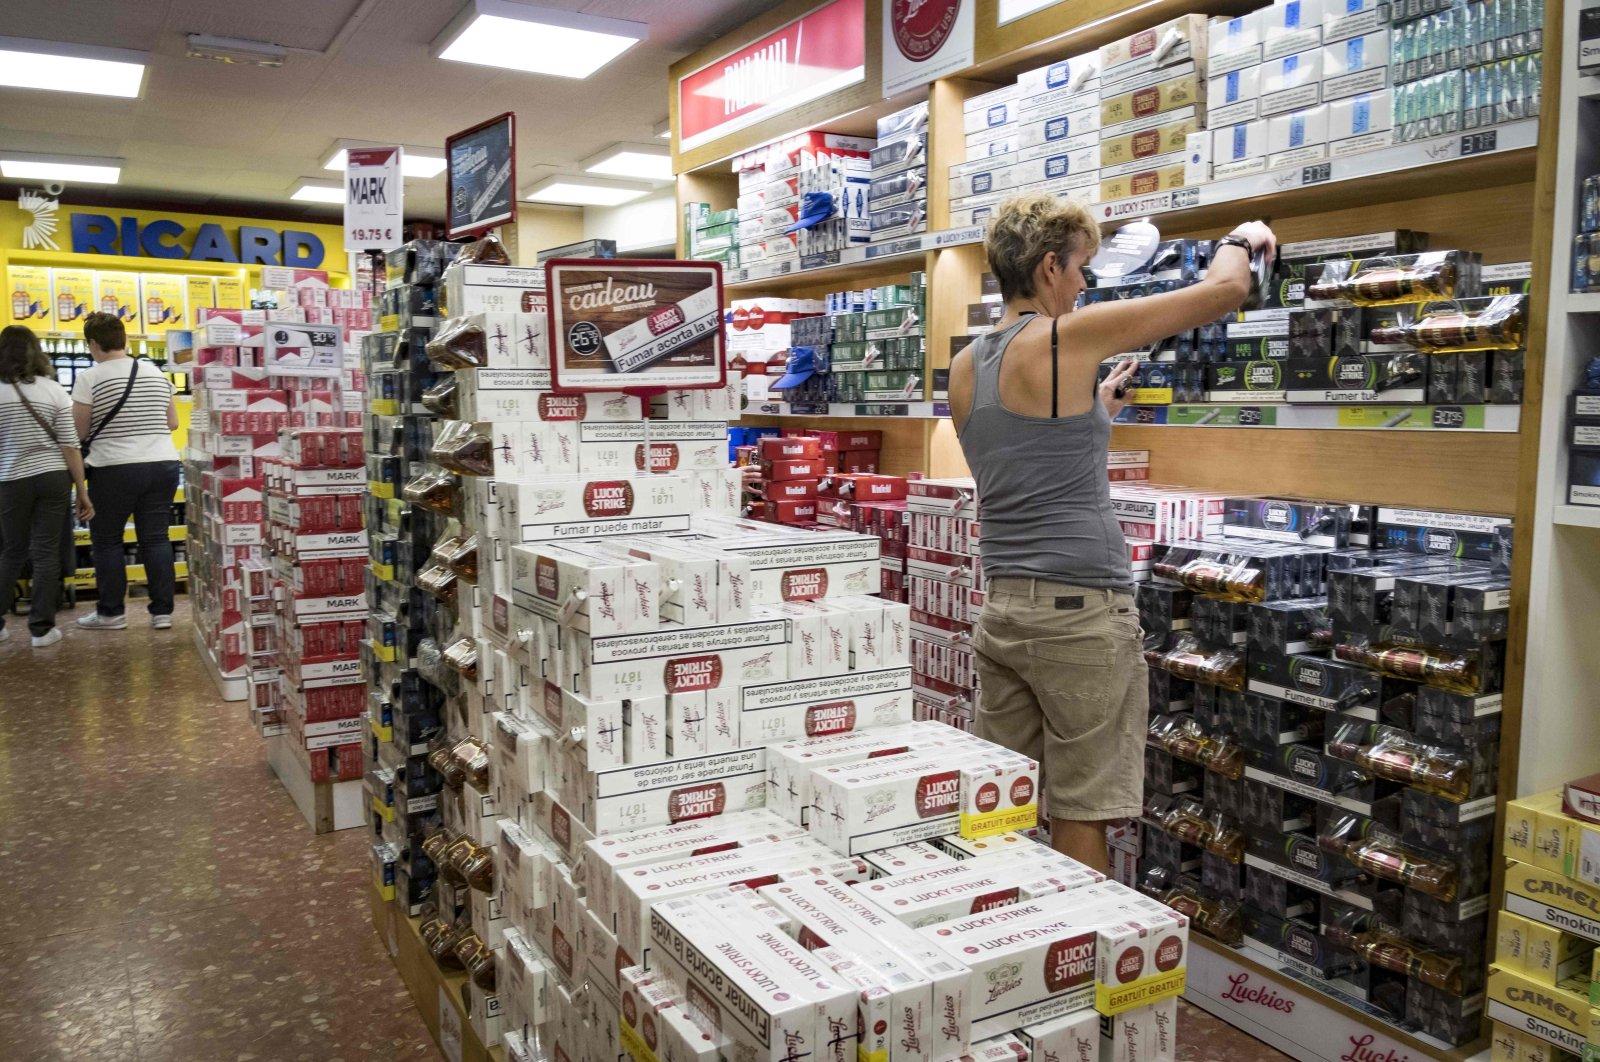 Customers purchase cigarettes in a supermarket in the town of Pas de la Casa, Andorra, Andorra, July 27, 2017. (AFP Photo)